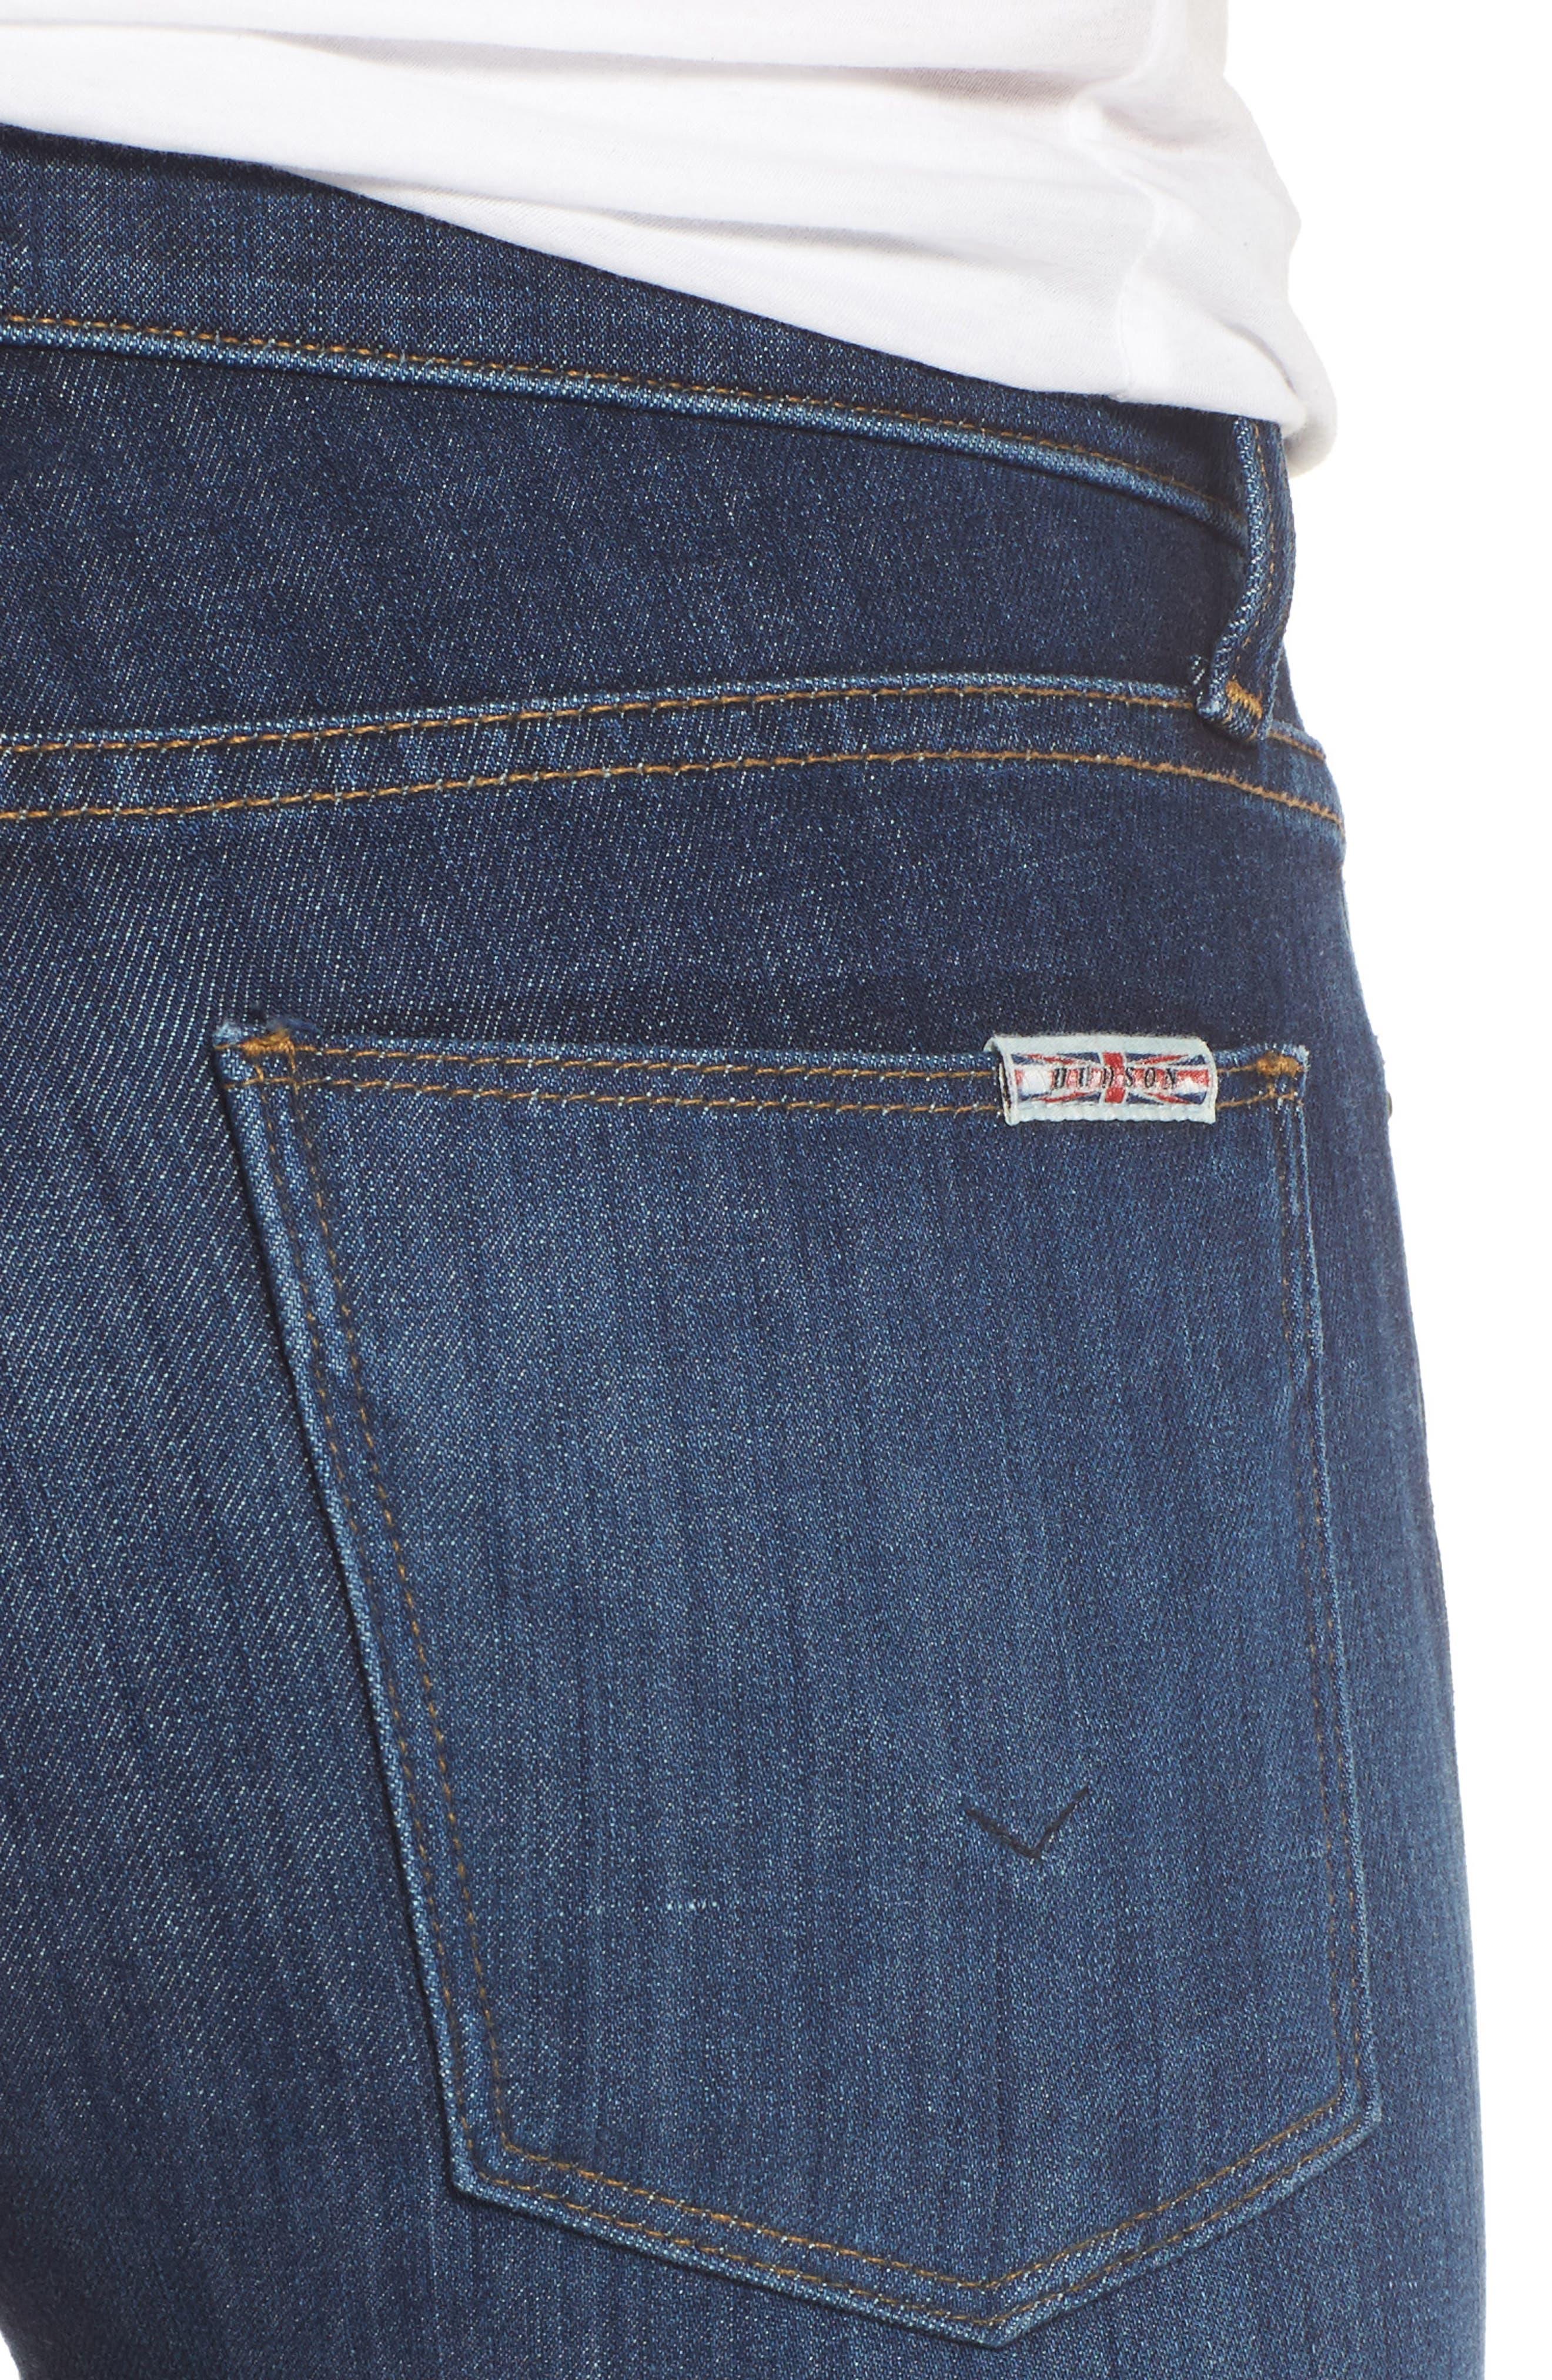 Nico Super Skinny Jeans,                             Alternate thumbnail 12, color,